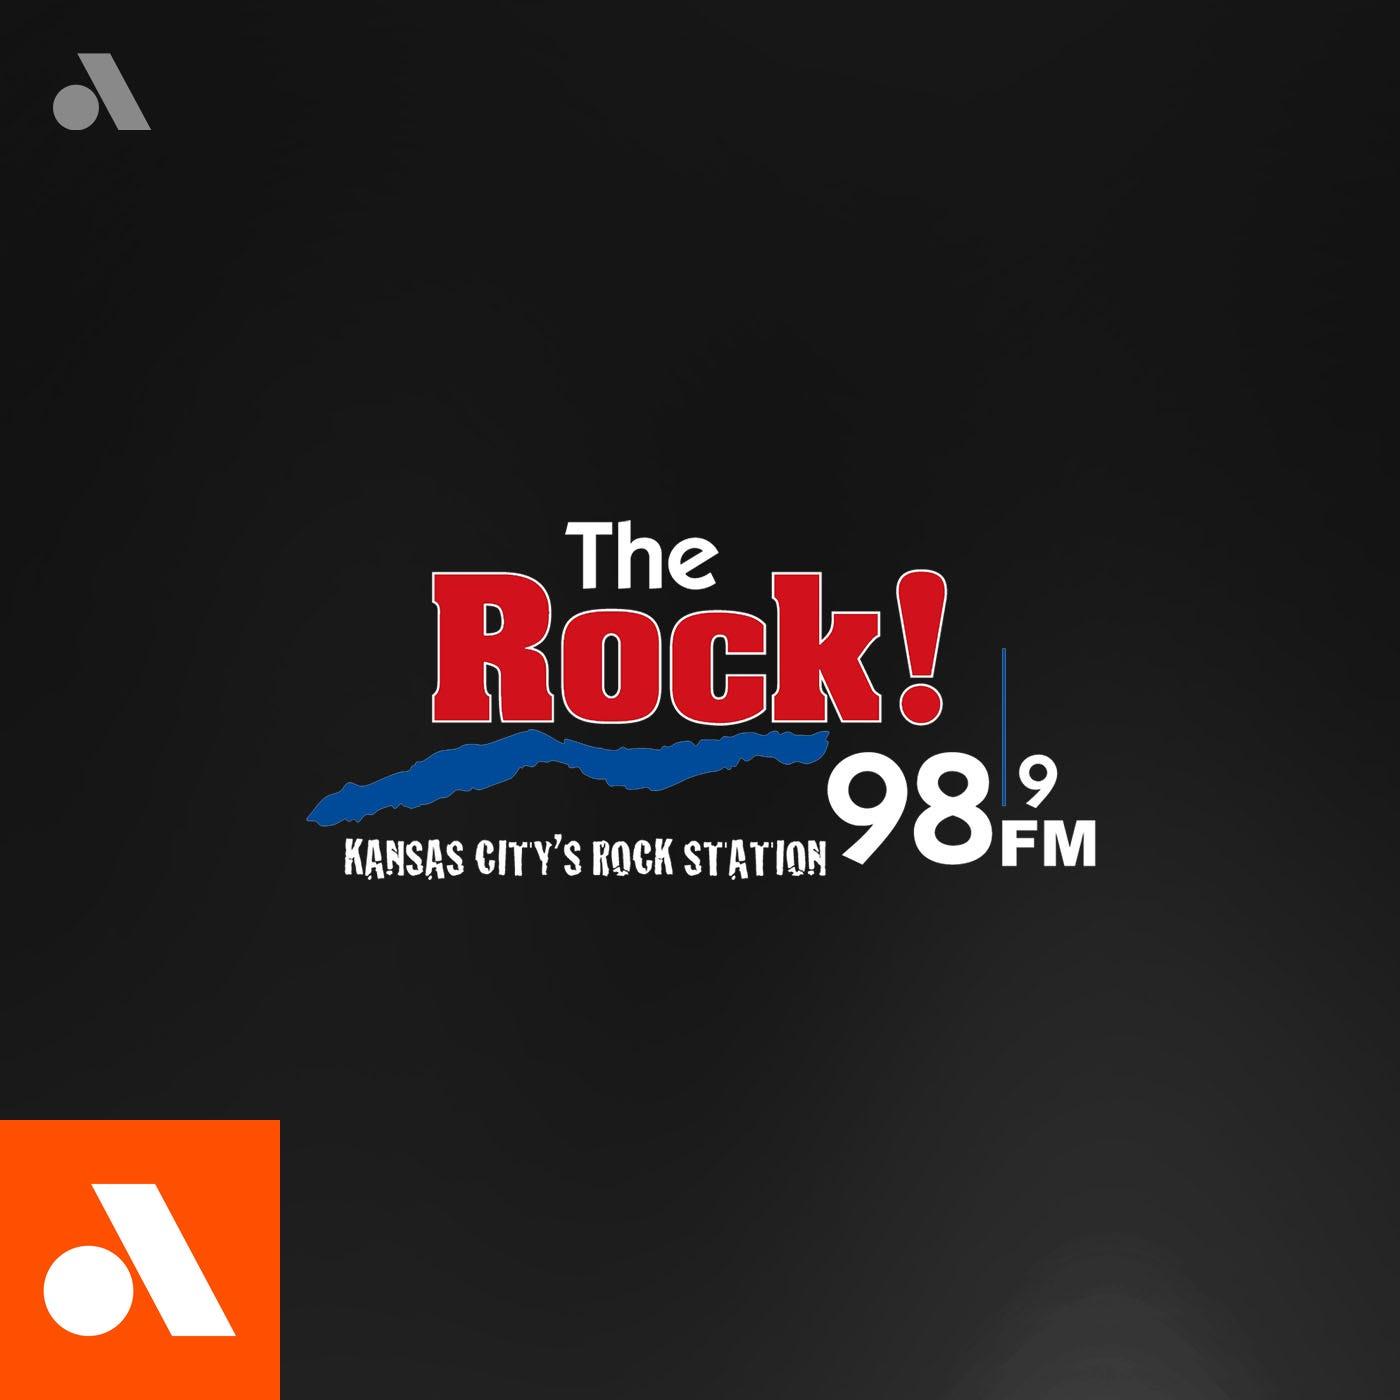 Kansas City Christmas Music Radio Station 2021 Audacy Listen To 500 Live Radio Stations Free